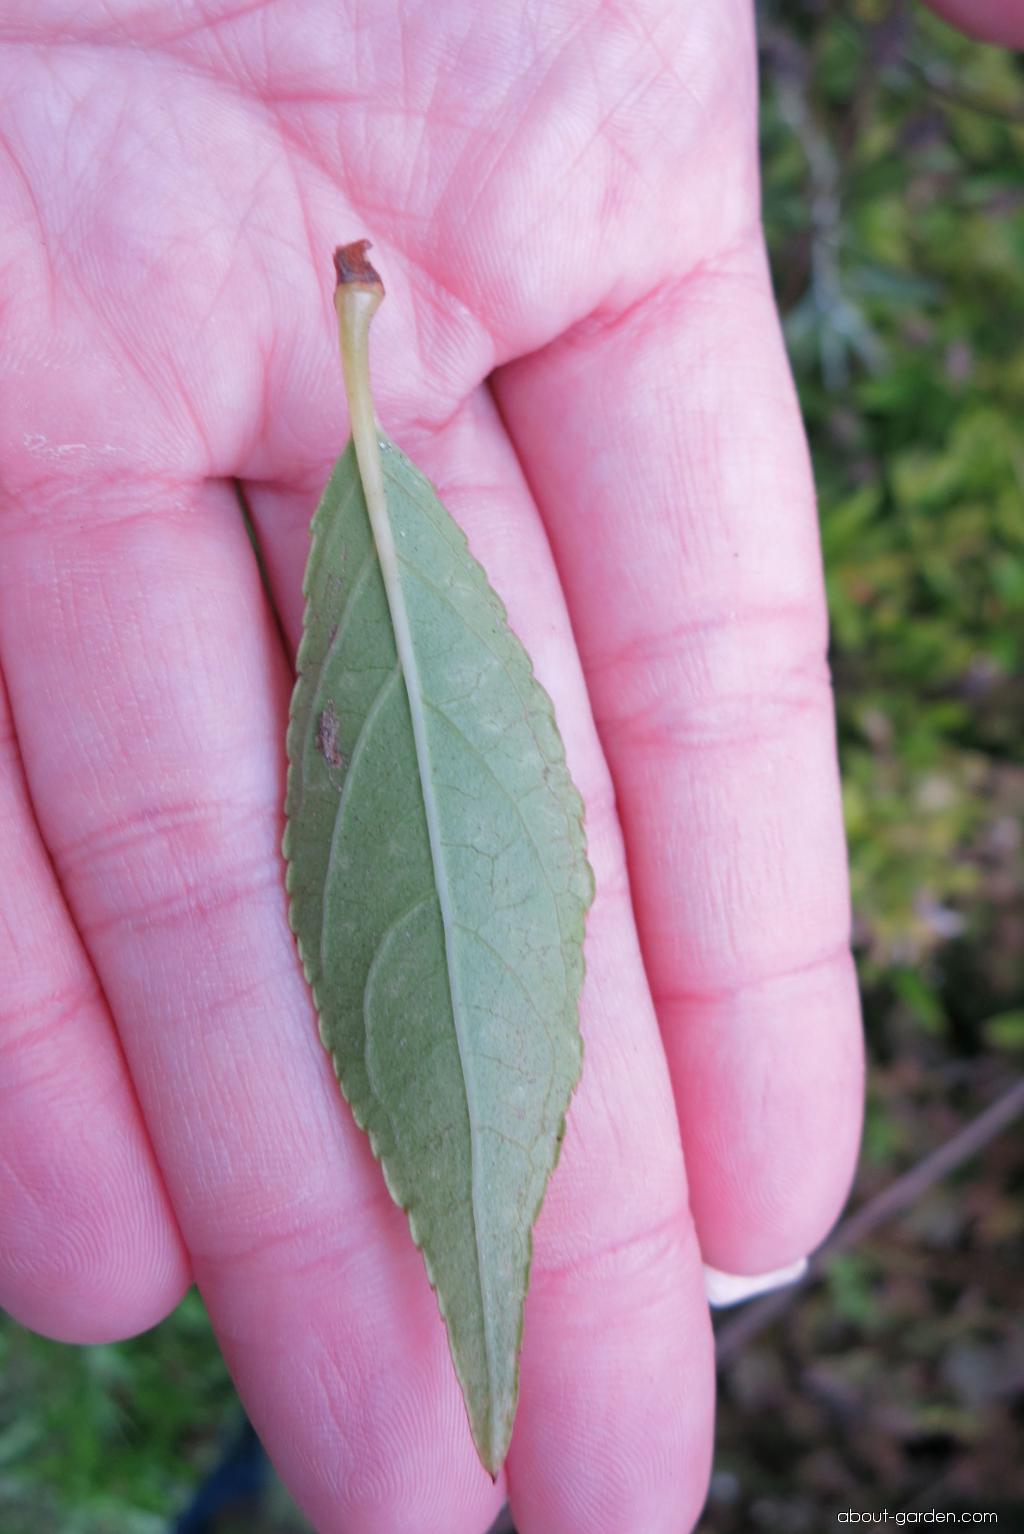 Trojpuk štíhlý - listy (Deutzia gracilis)